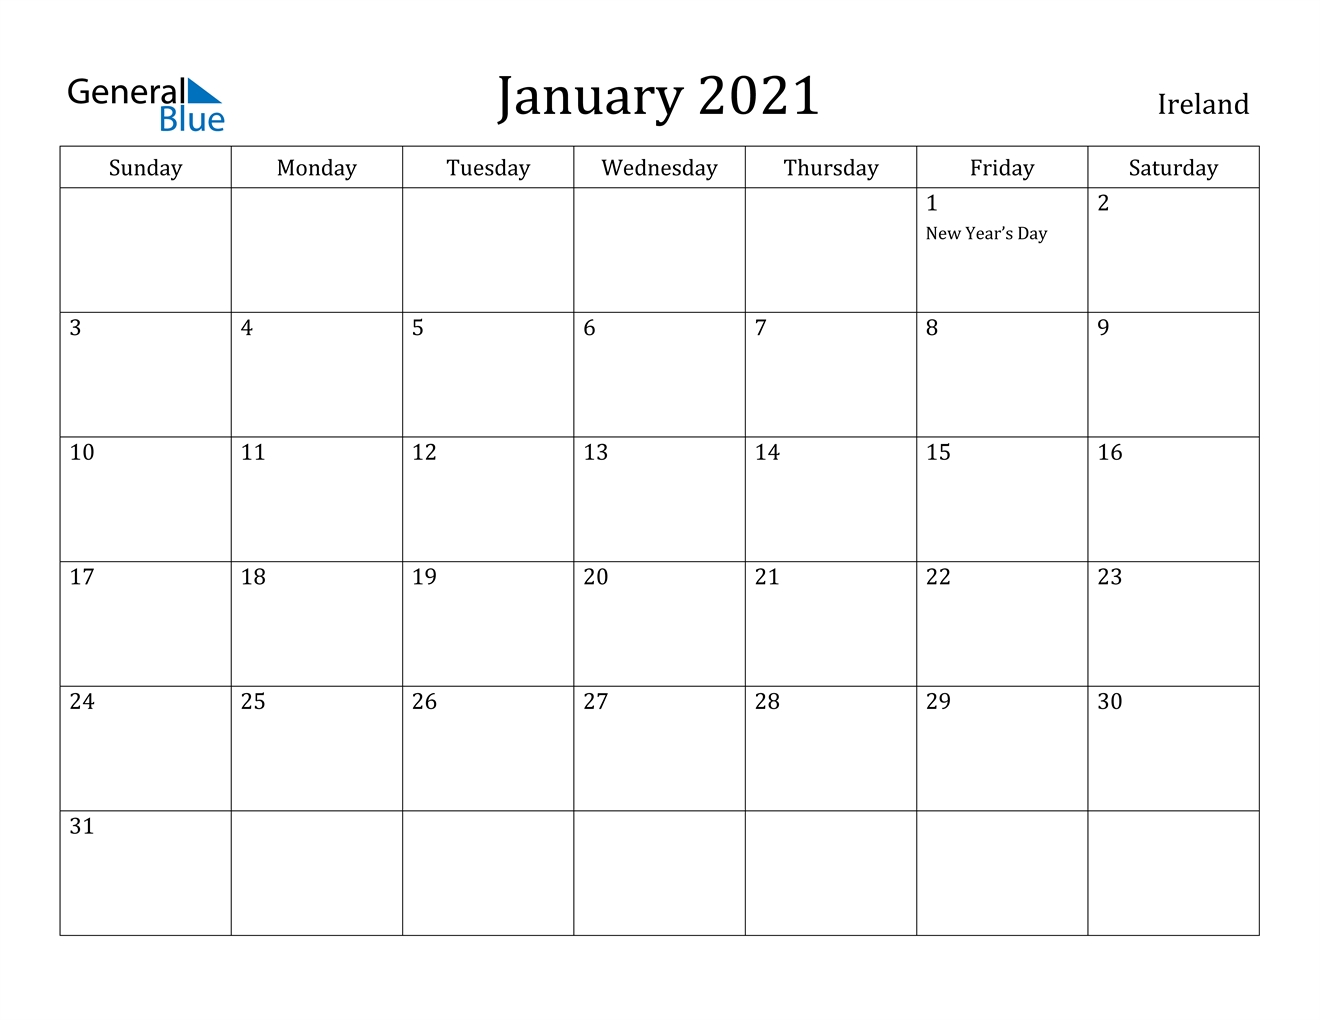 January 2021 Calendar - Ireland